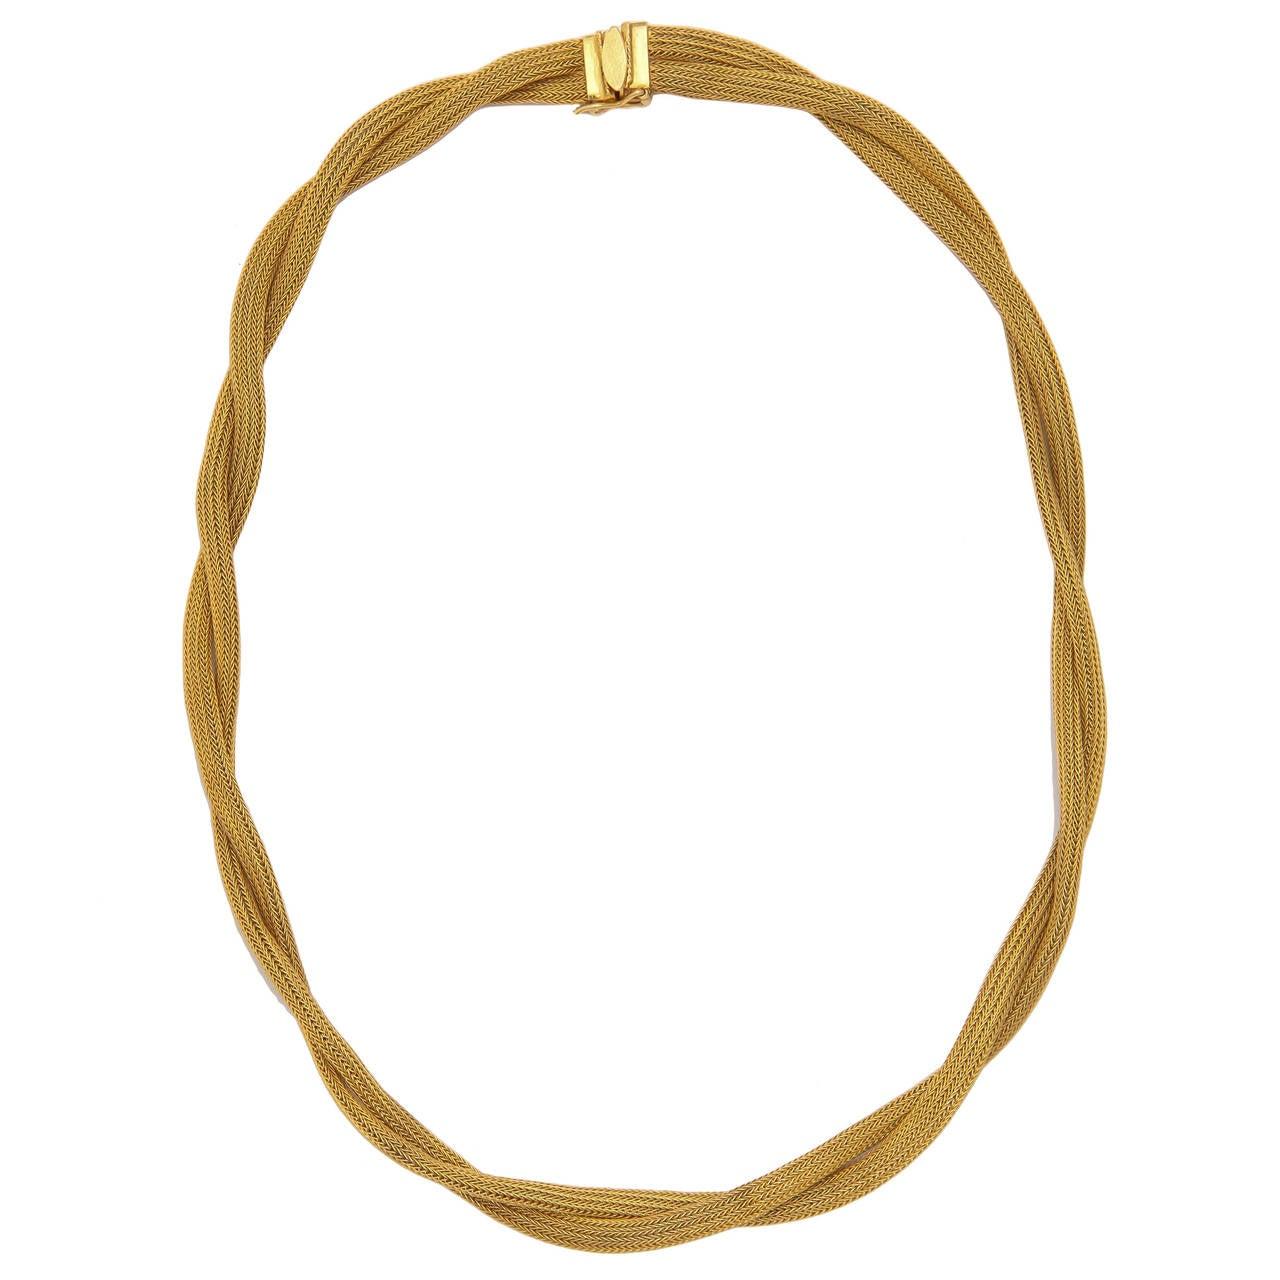 Handmade Woven gold chain